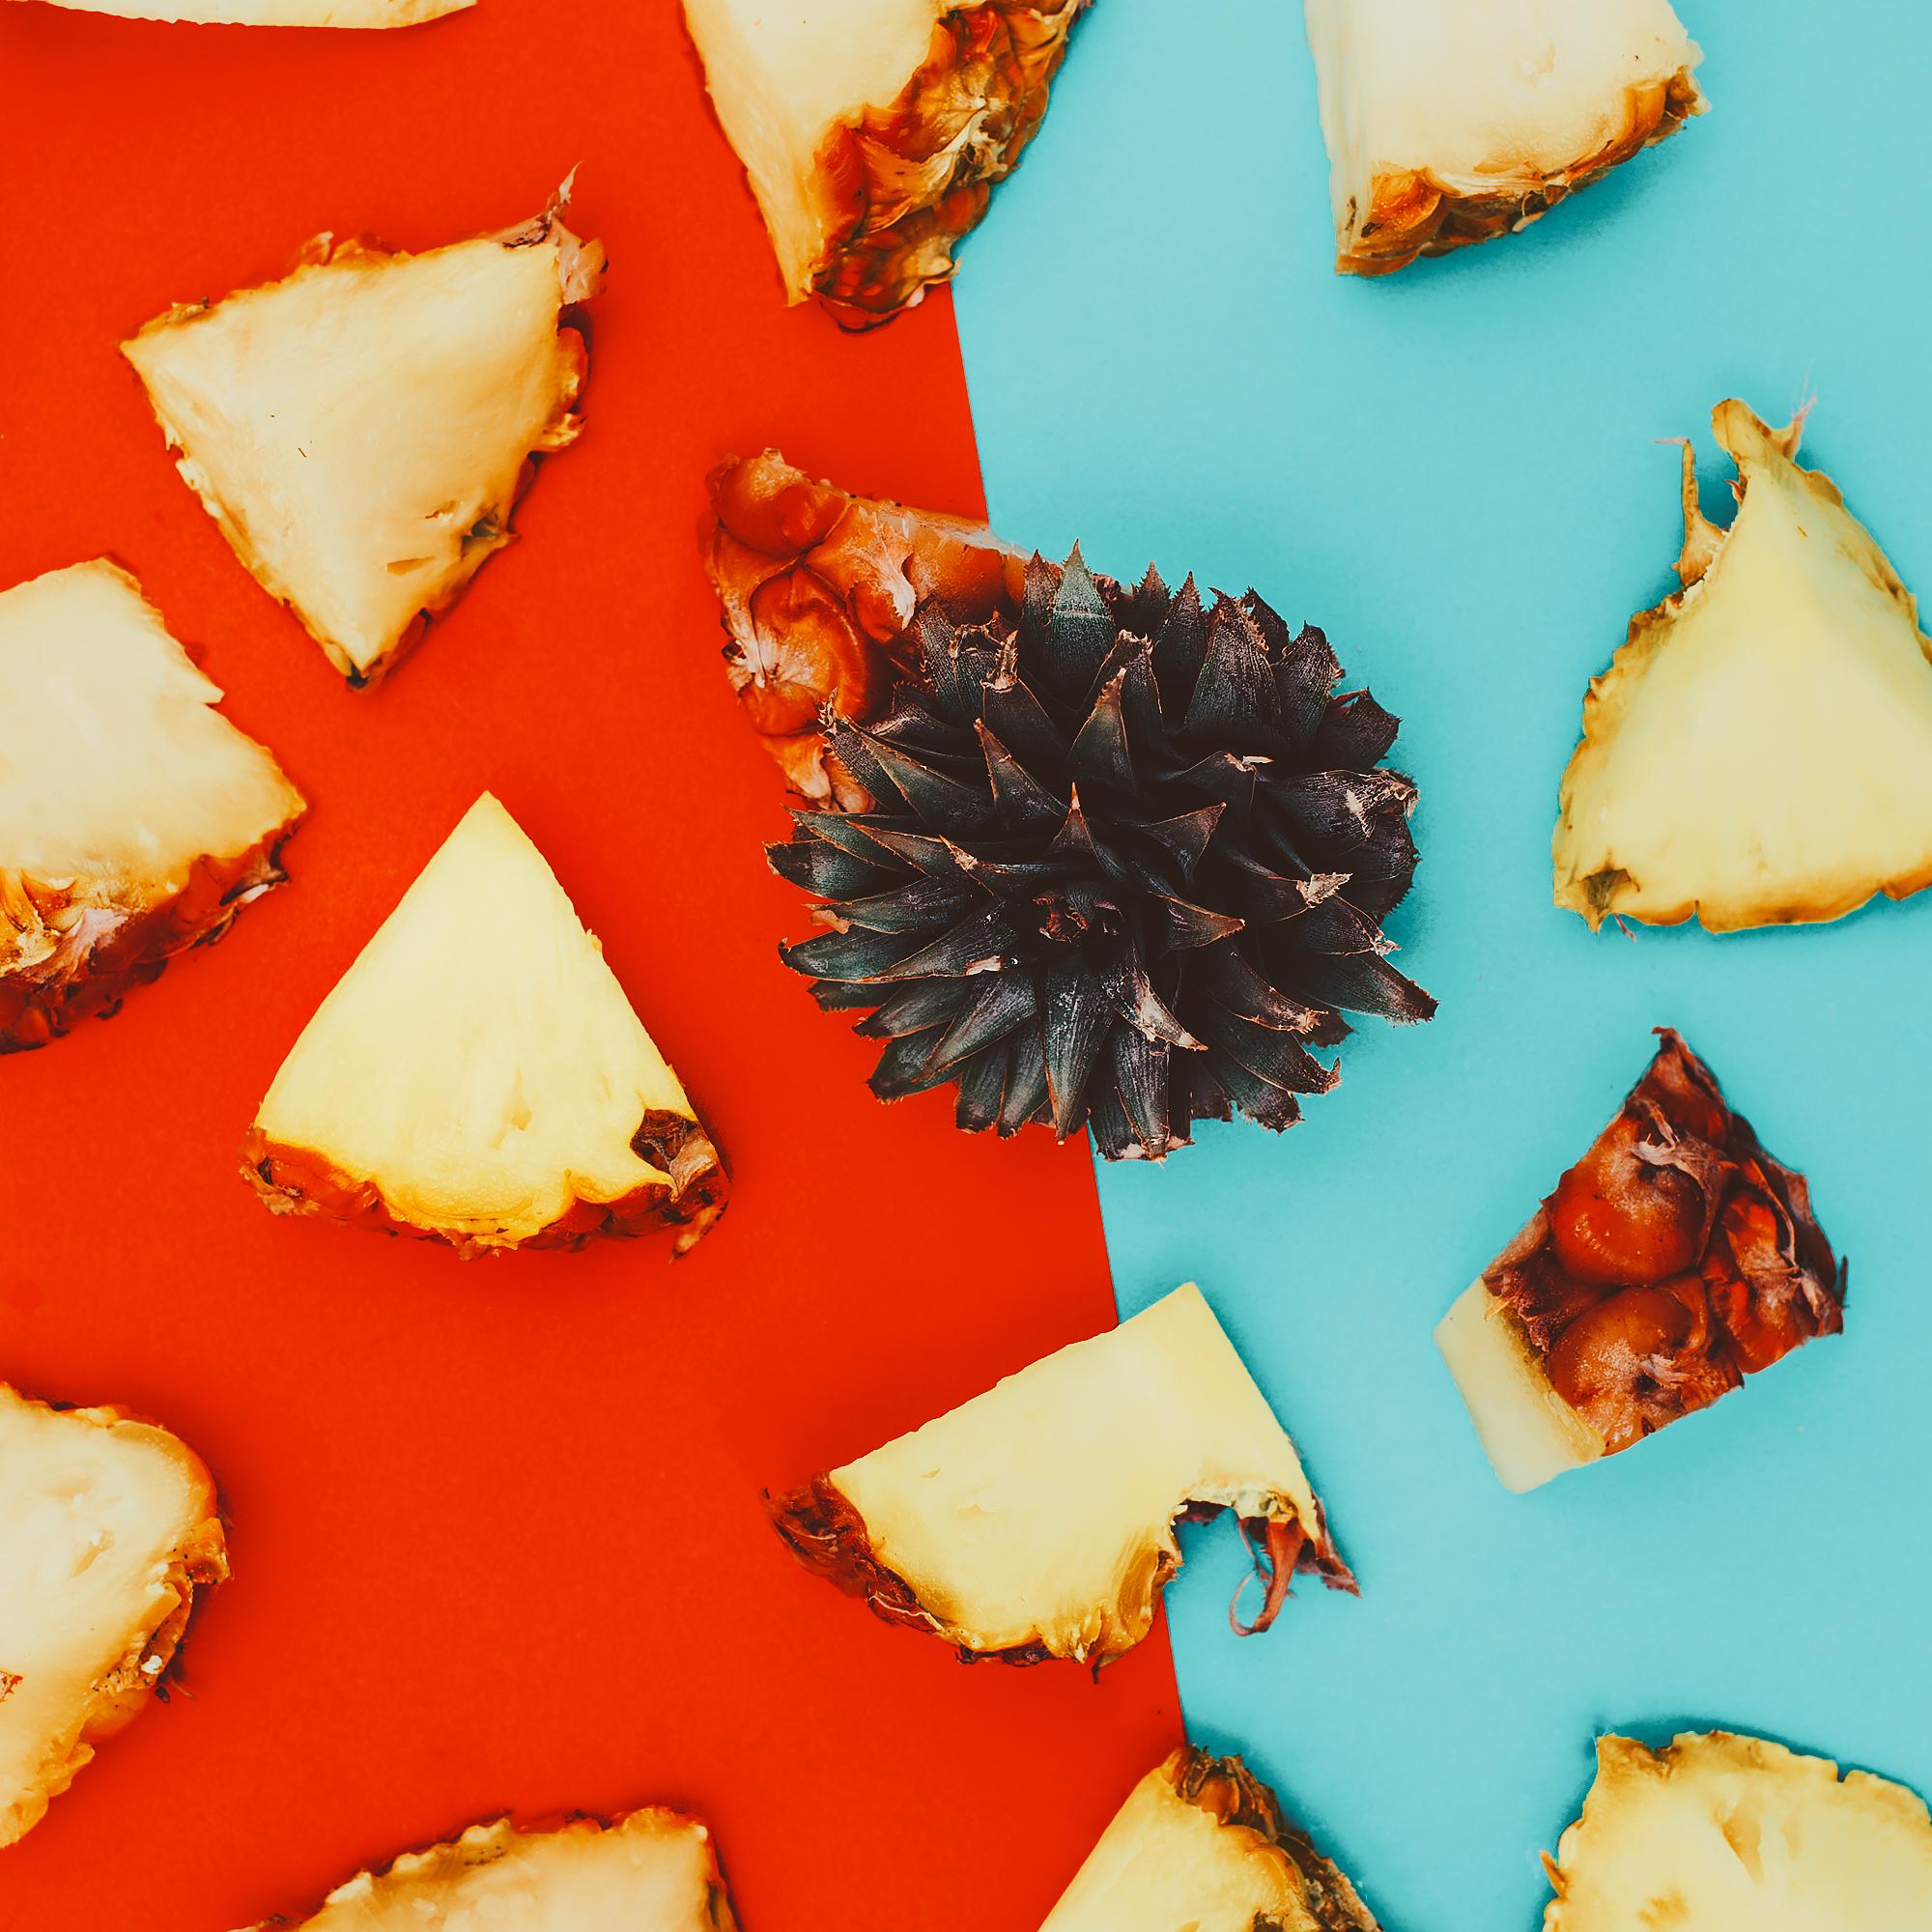 pineapple_boringgraphics.jpg